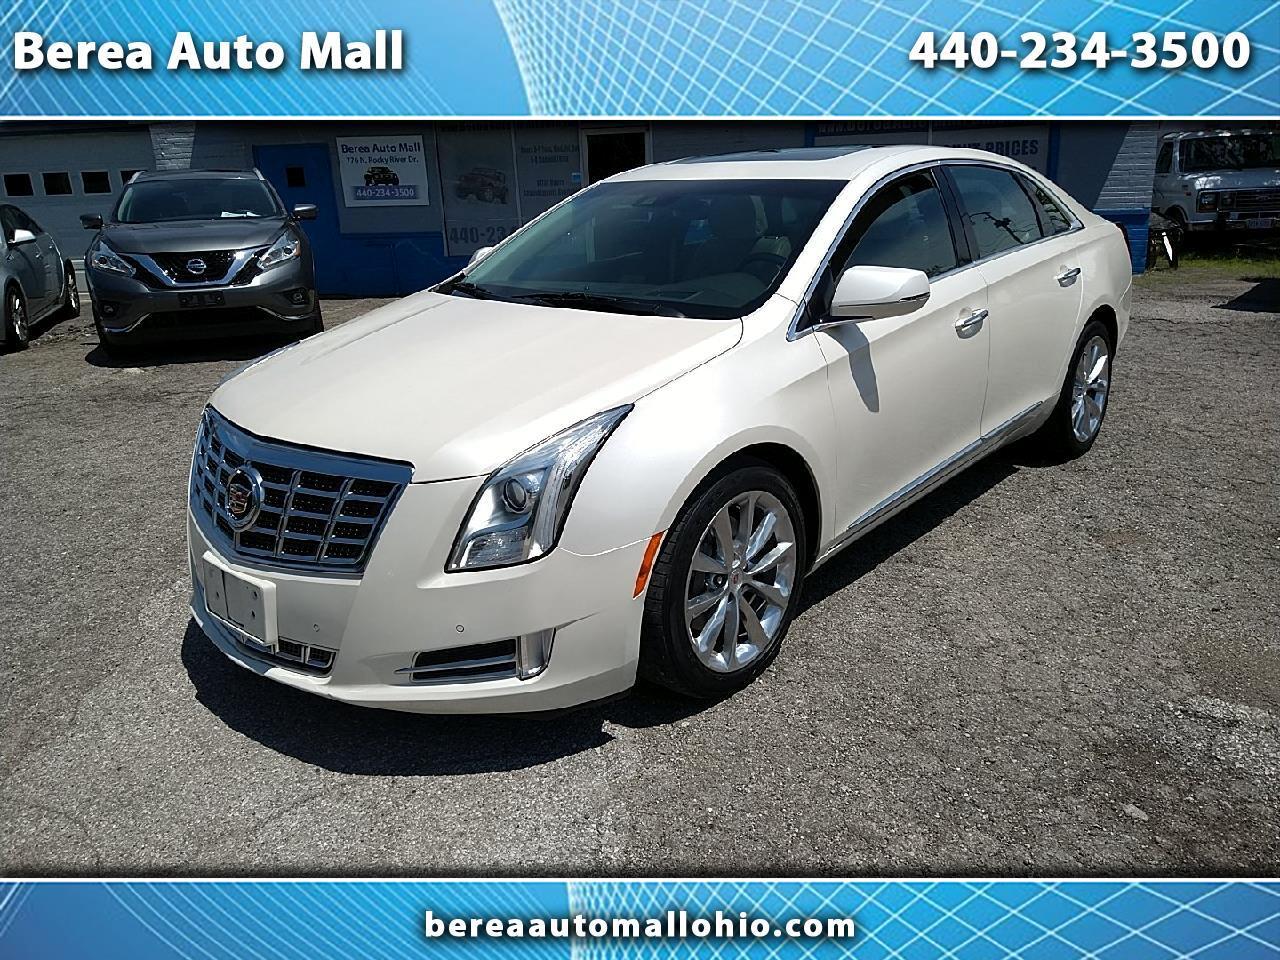 2013 Cadillac XTS 4dr Sdn Premium AWD